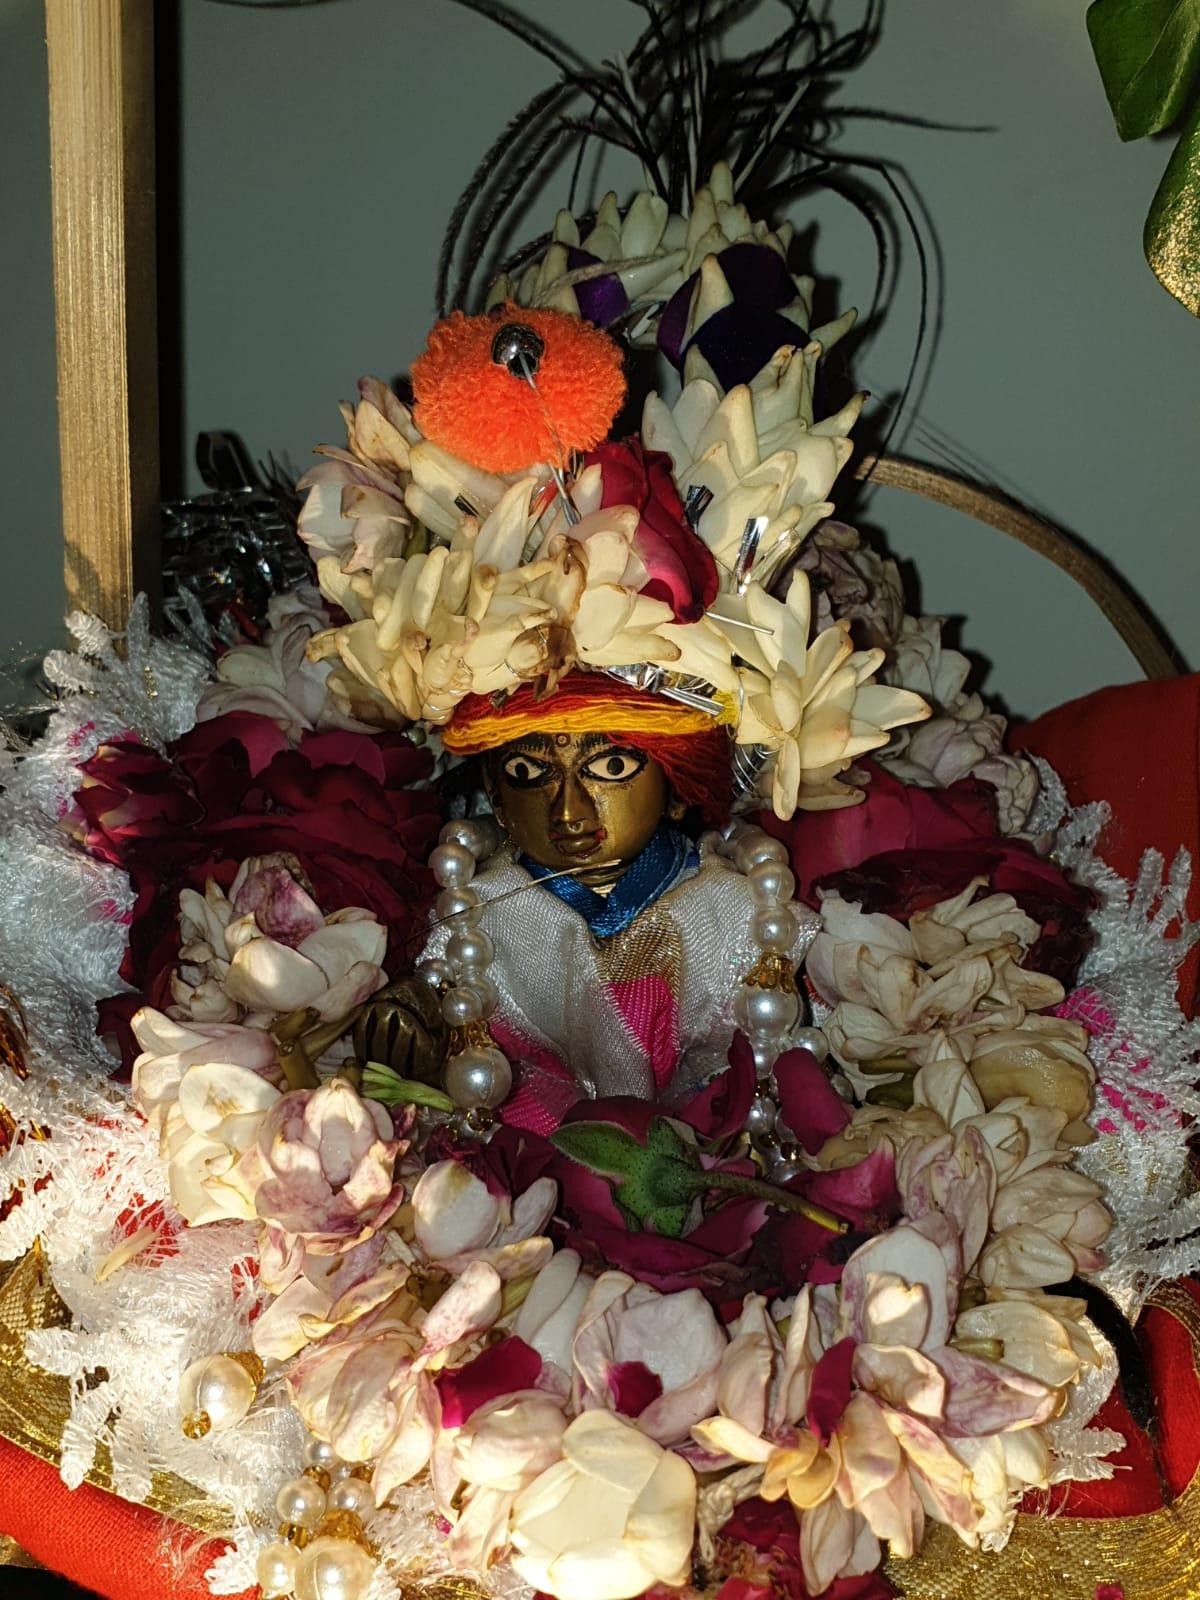 Excellent information about Bhagwan Shri Krishna